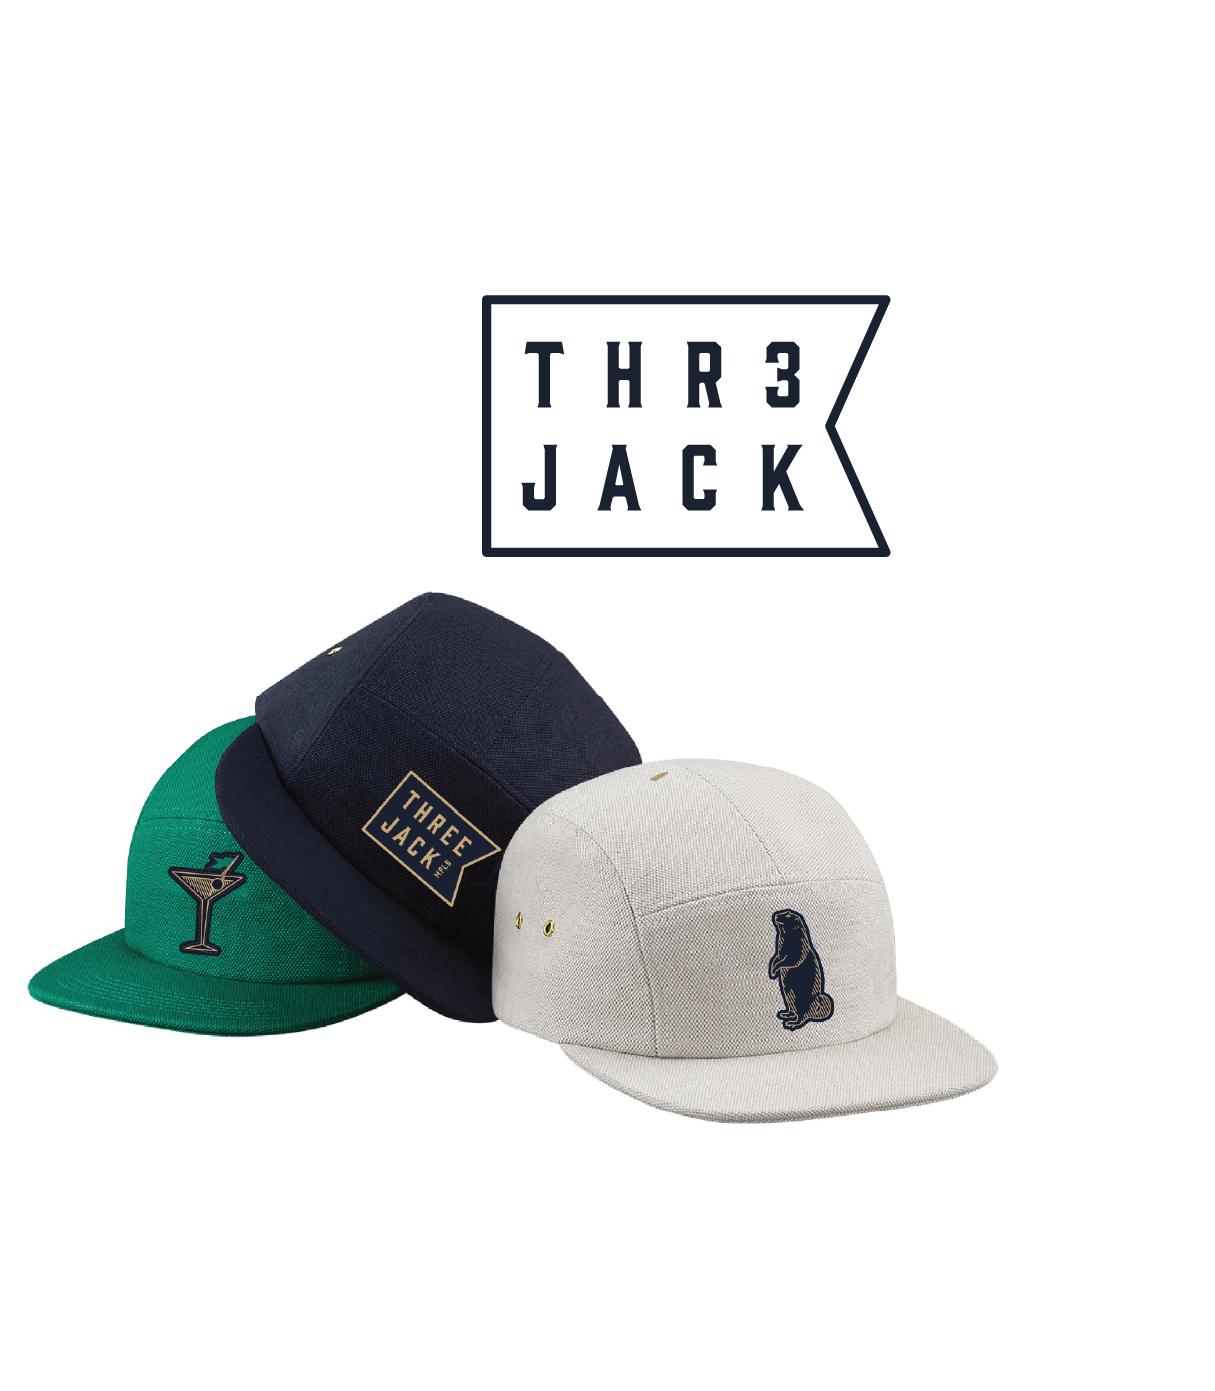 Thr3 Jack image